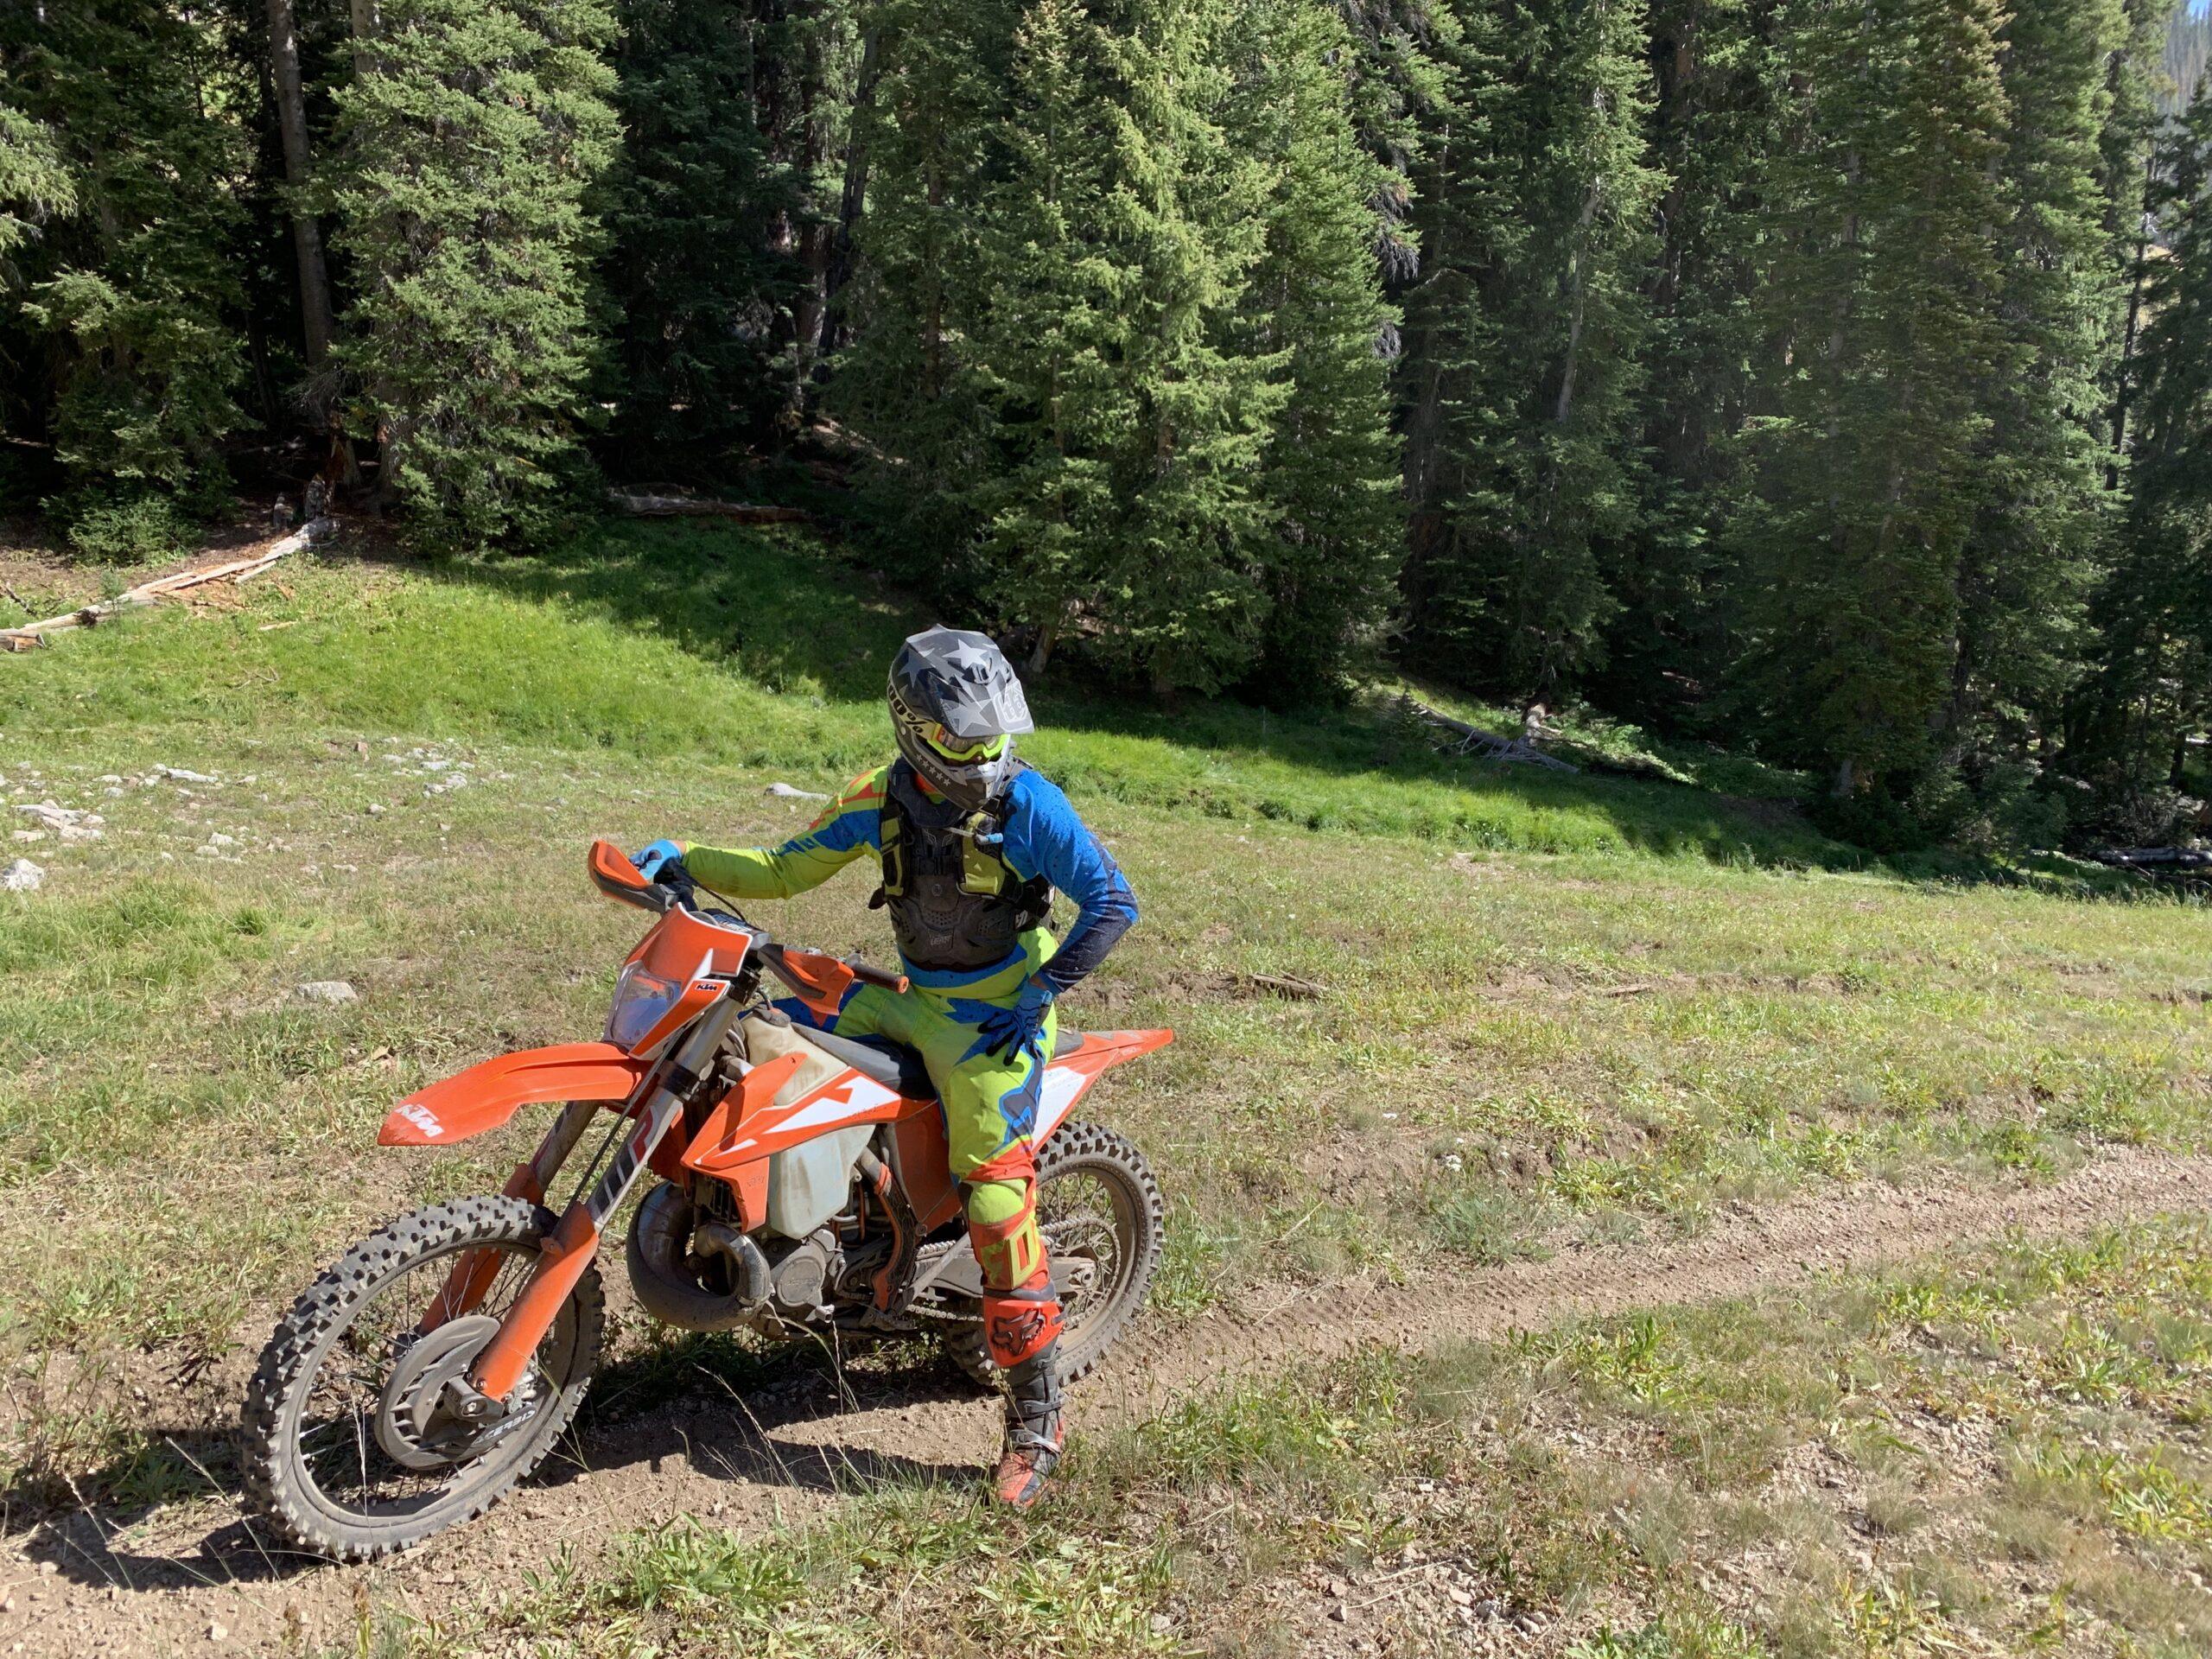 How To Create Your Own Dirt Bike Track Dirtbike Sam